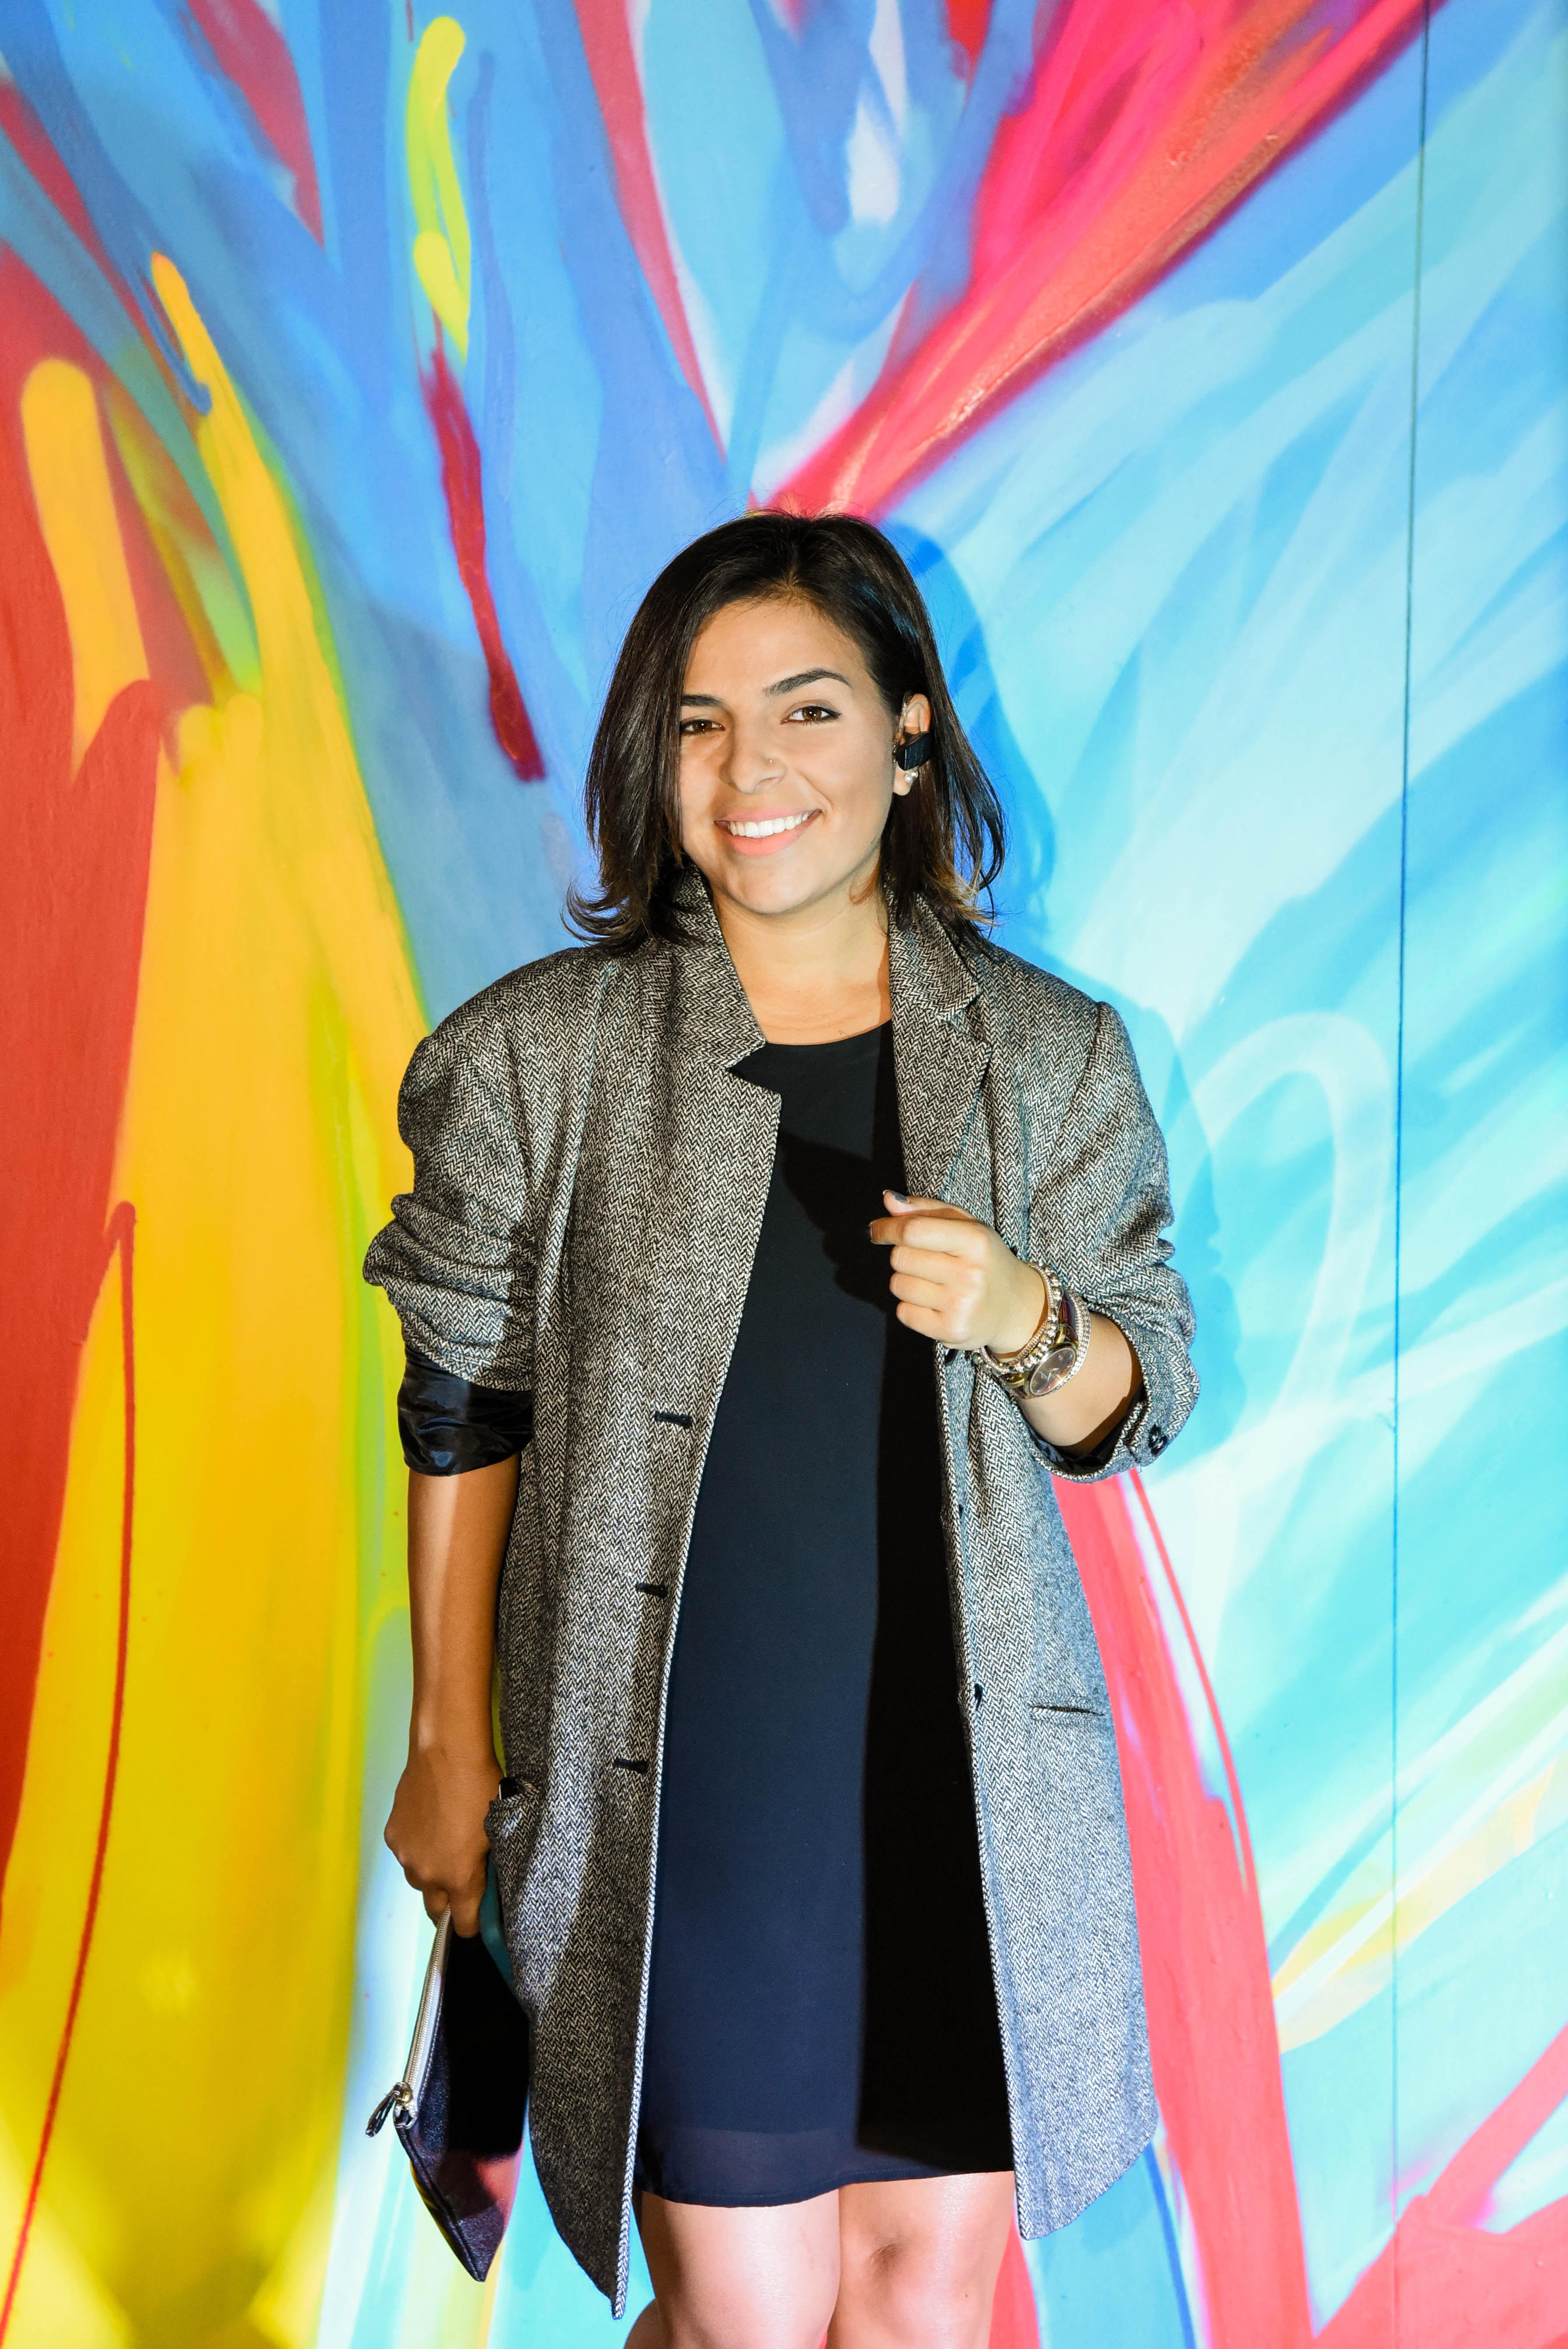 Arzu Huseynova 2018 UncommonGoods design scholarship winner